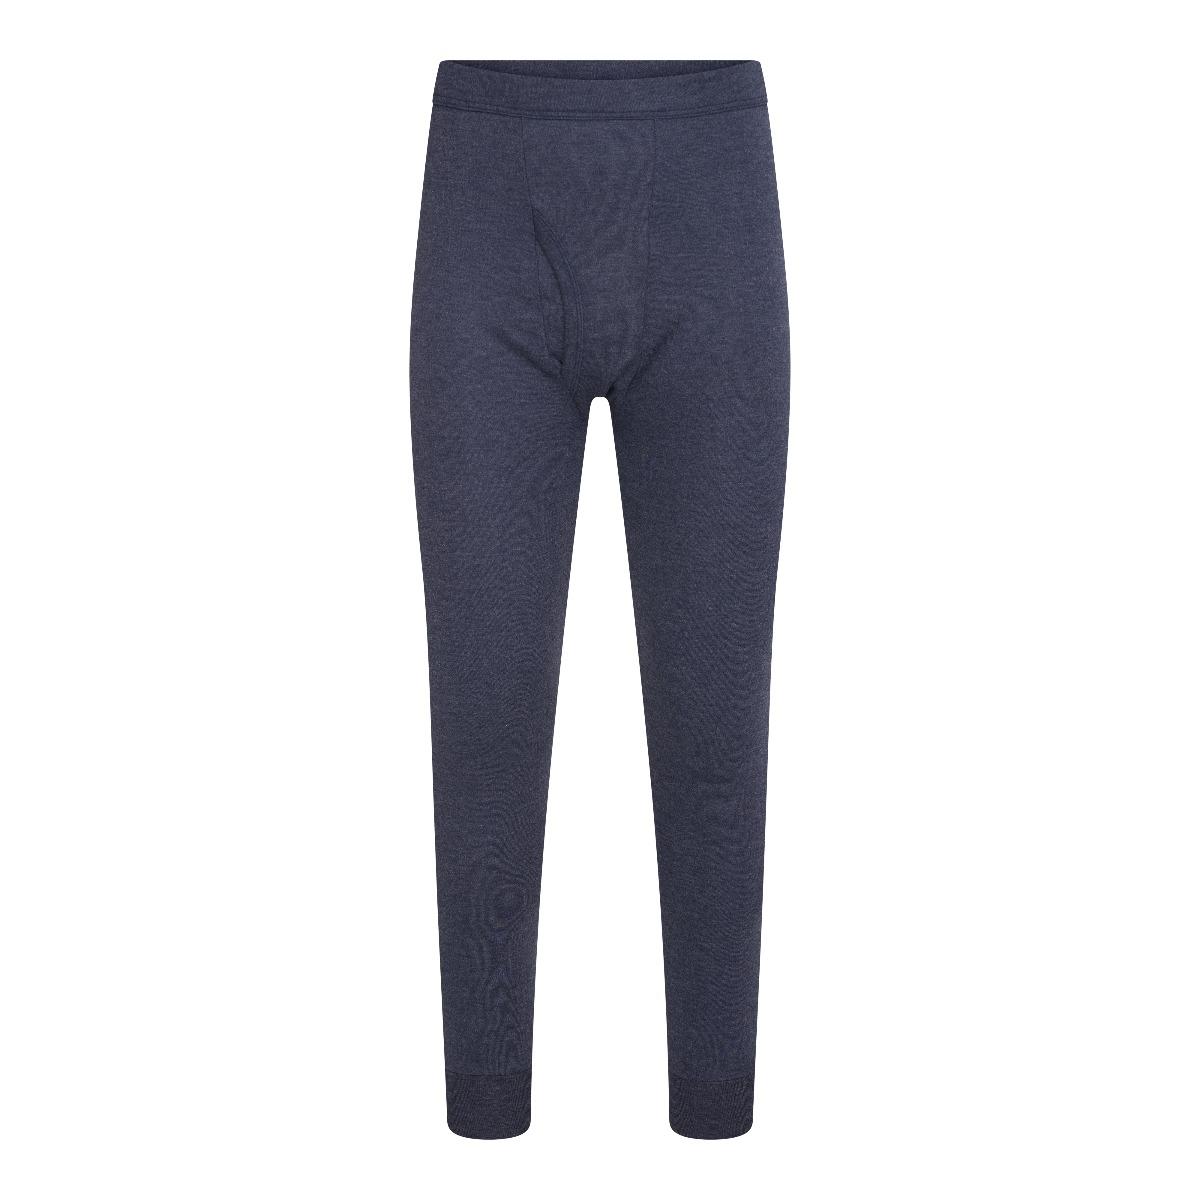 Beeren Thermo Heren Pantalon Marine L